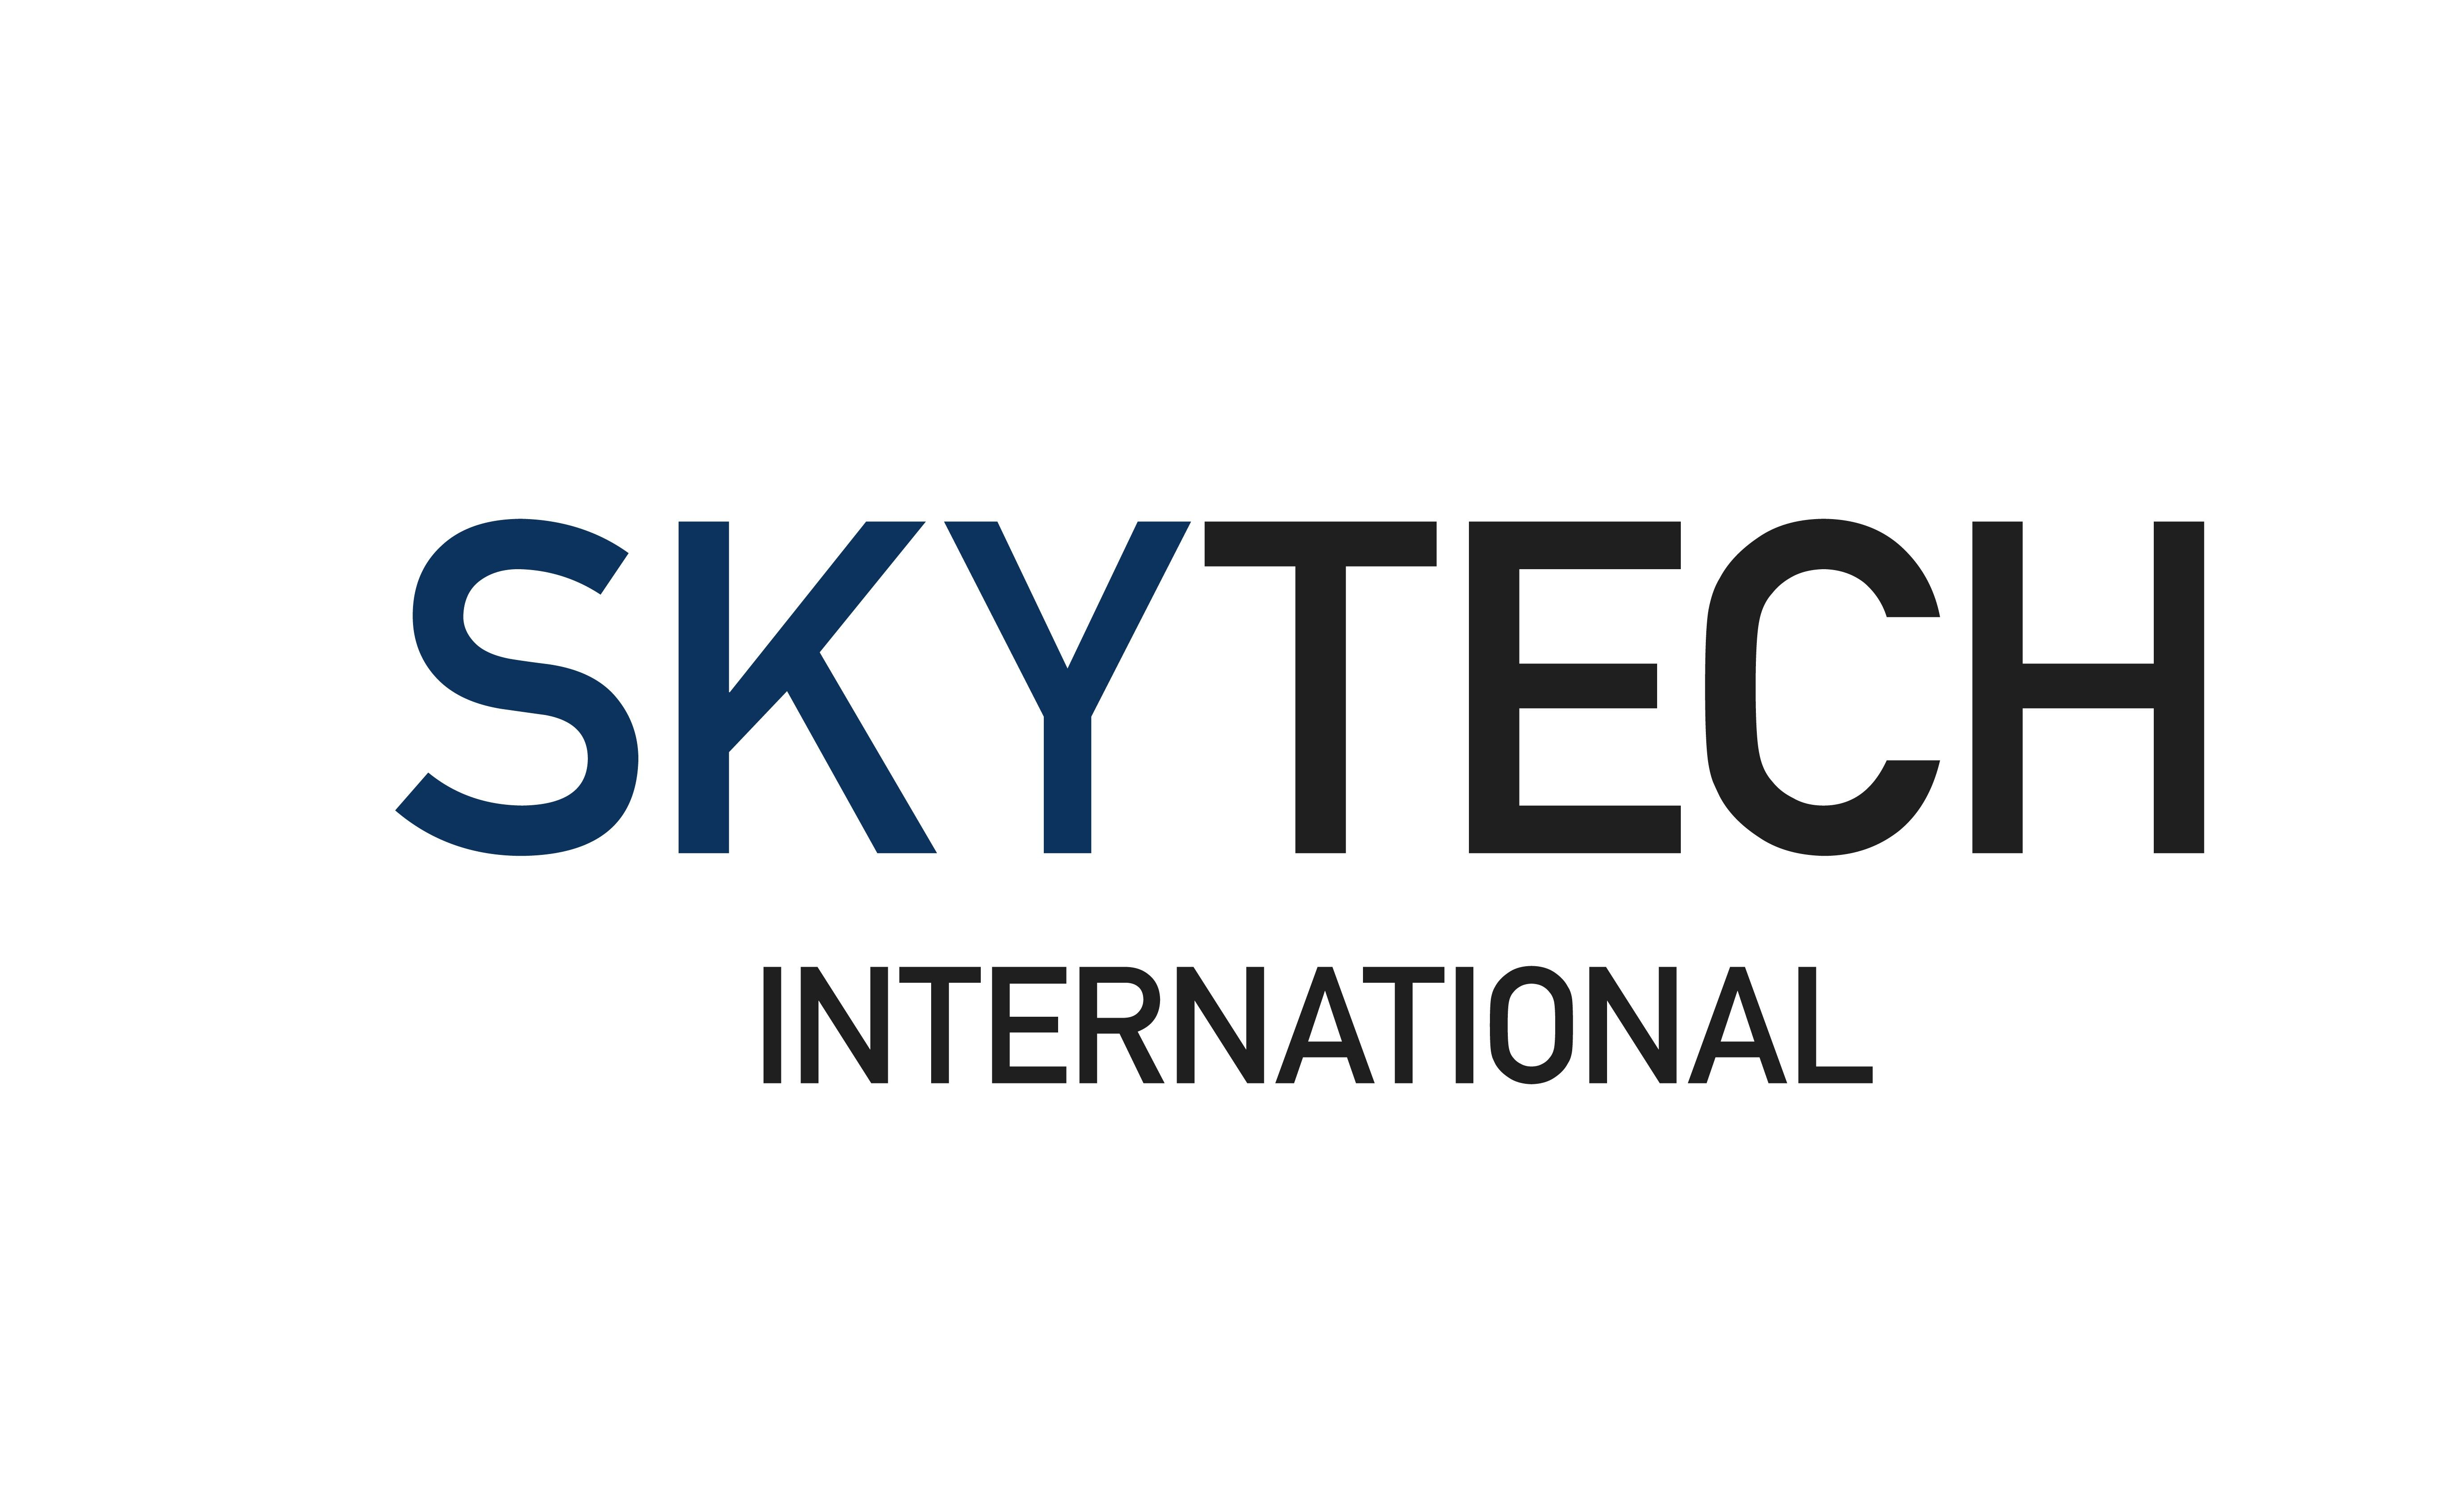 Skytech International Ltd